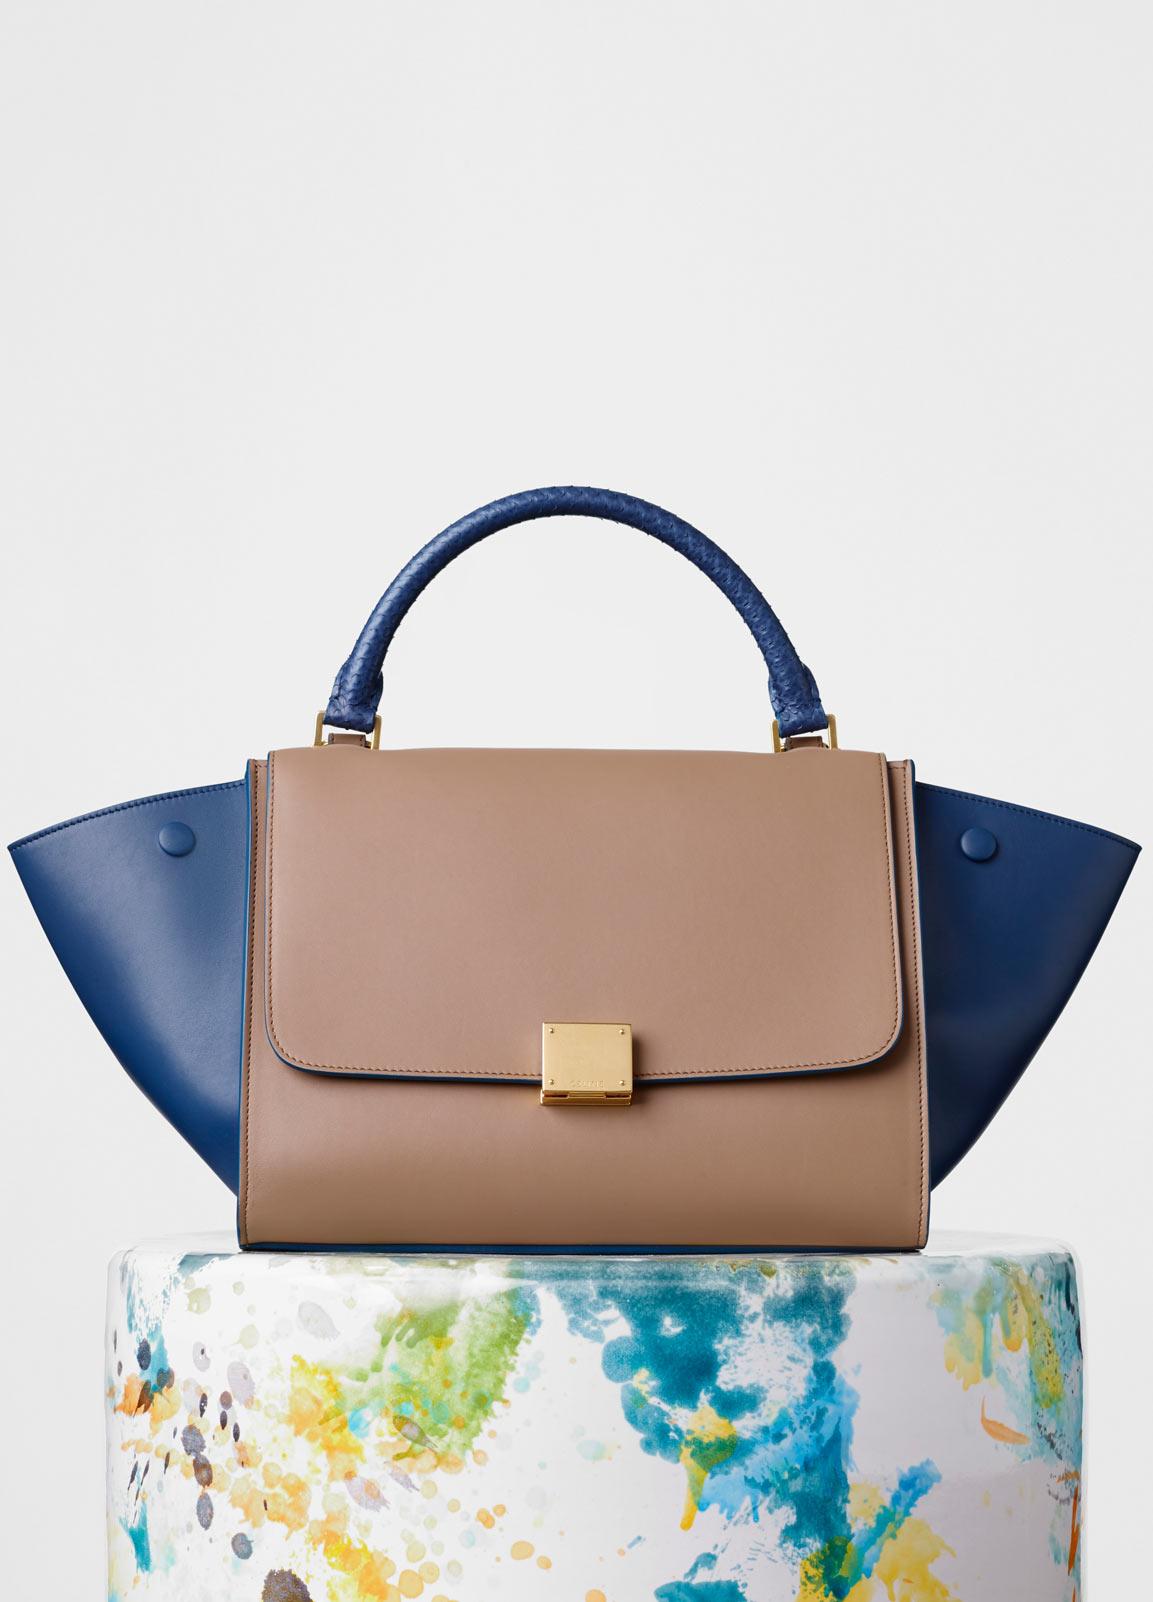 61ea10e0ad43 celine fall winter 2015 bags handbags purses season collection. 6. Small  Trapeze ...